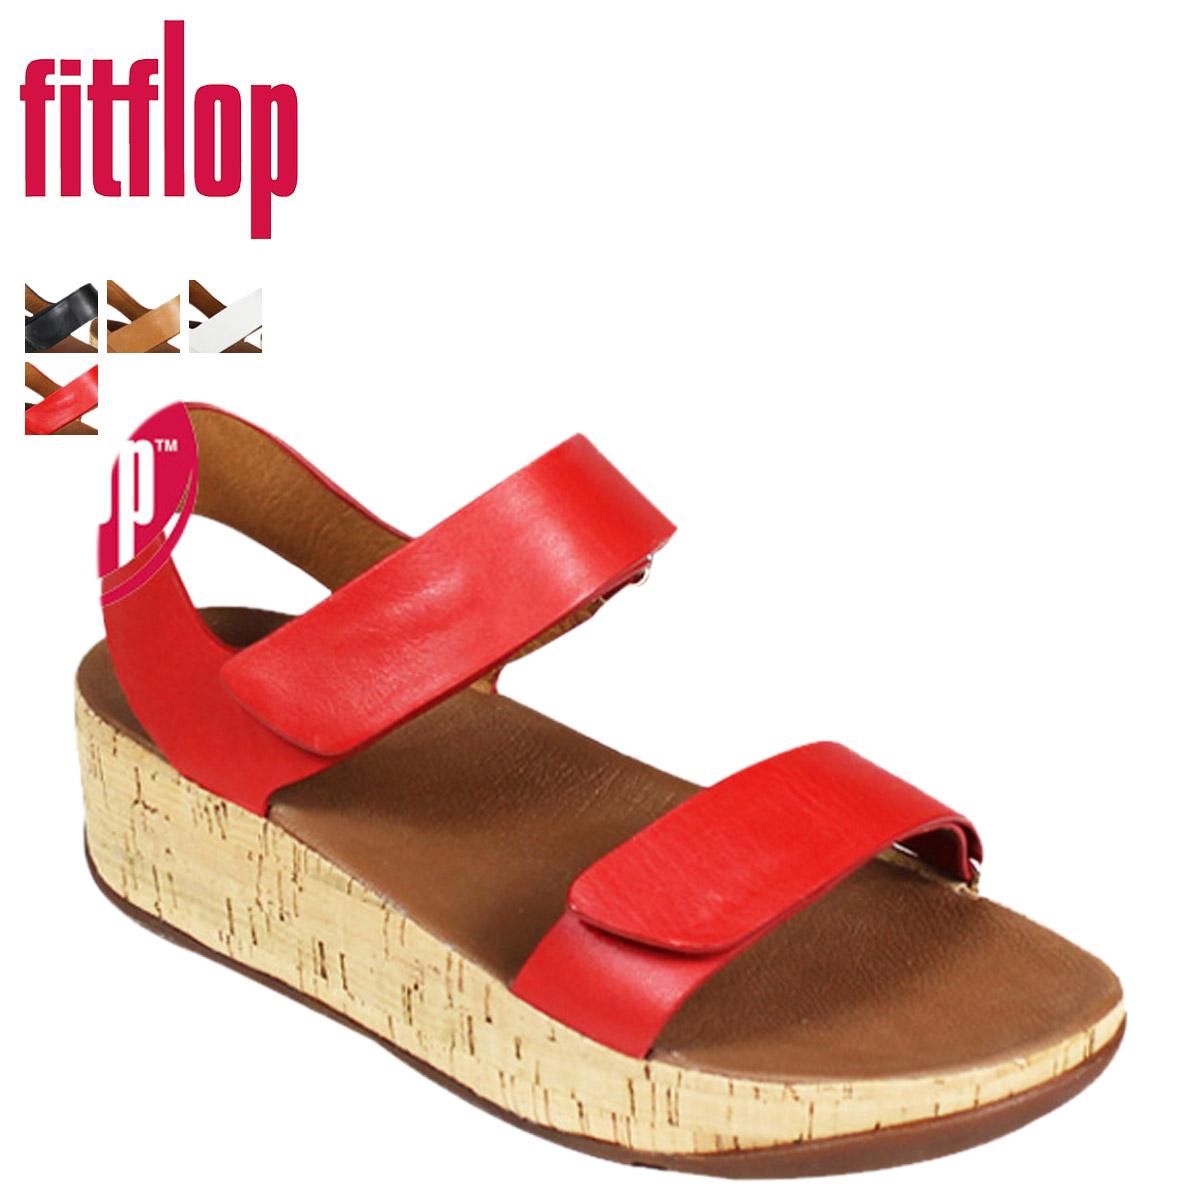 [SOLD OUT]合身FLOP FitFlop BON EASY波恩E G凉鞋4彩色皮革SANDAL 363女士